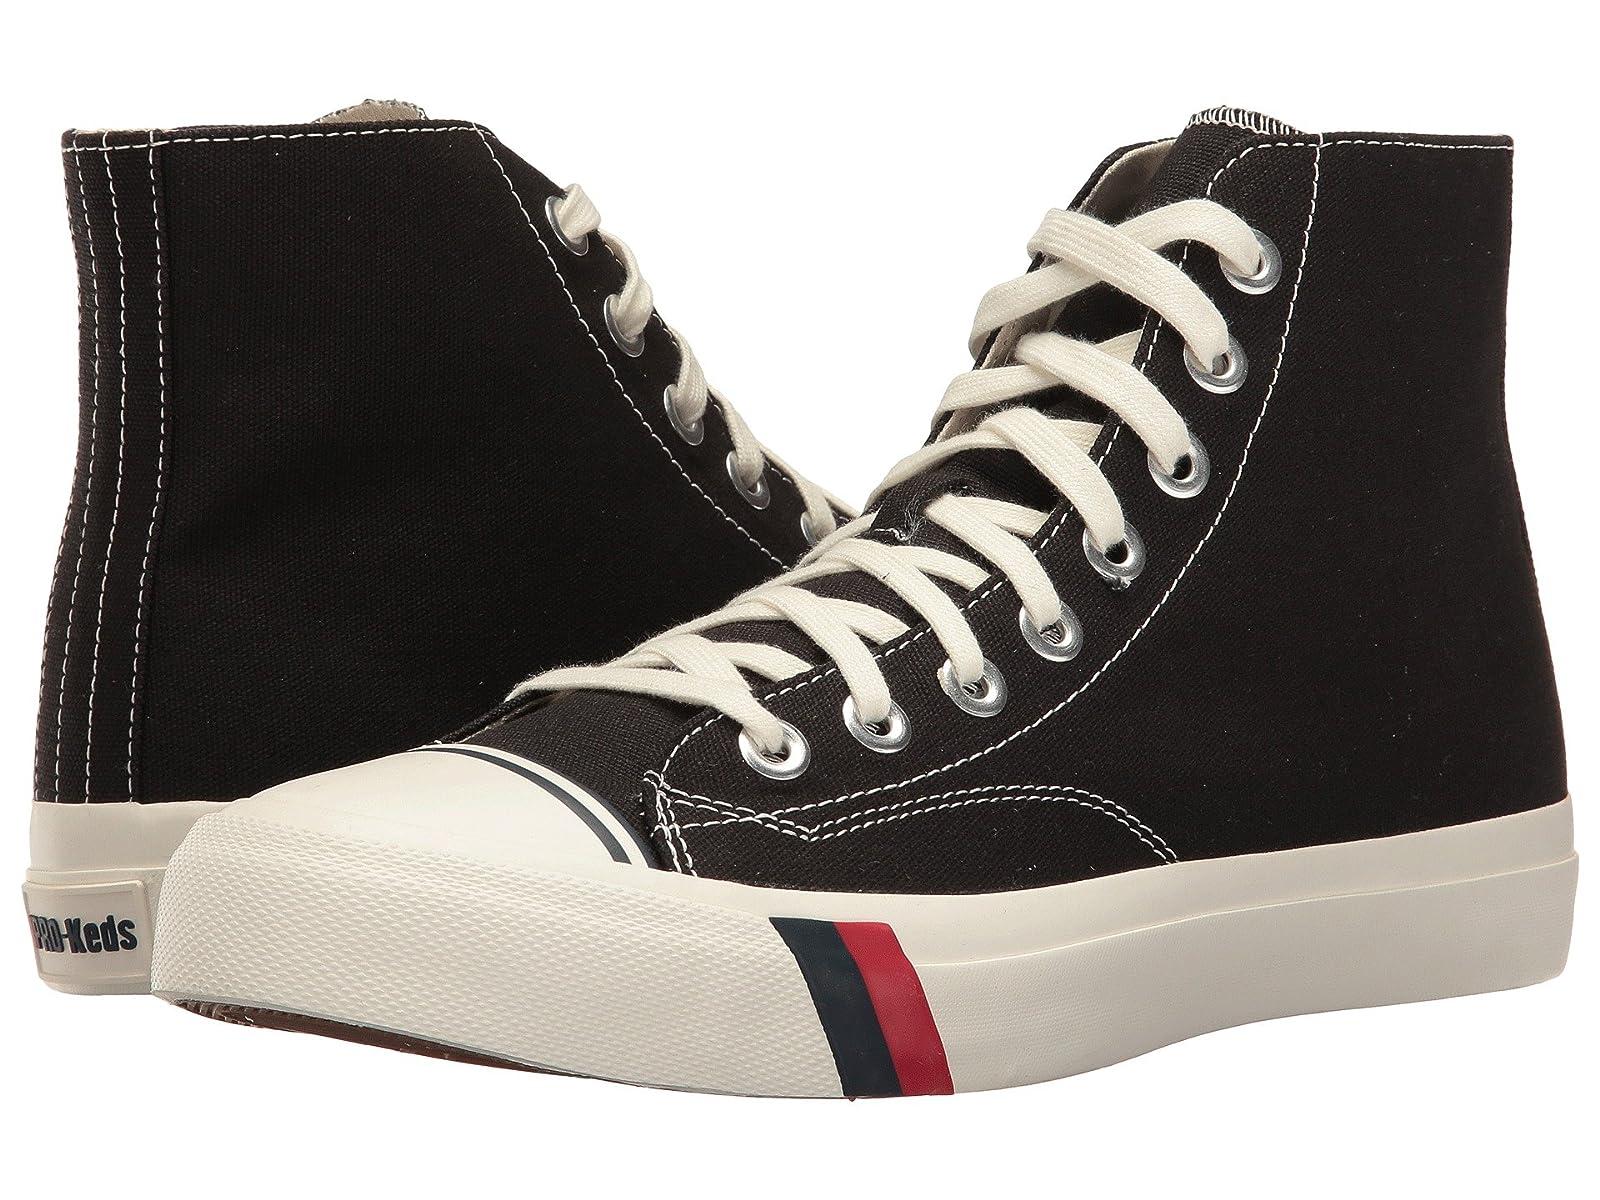 Keds Pro-Keds Royal Hi Classic CanvasAtmospheric grades have affordable shoes